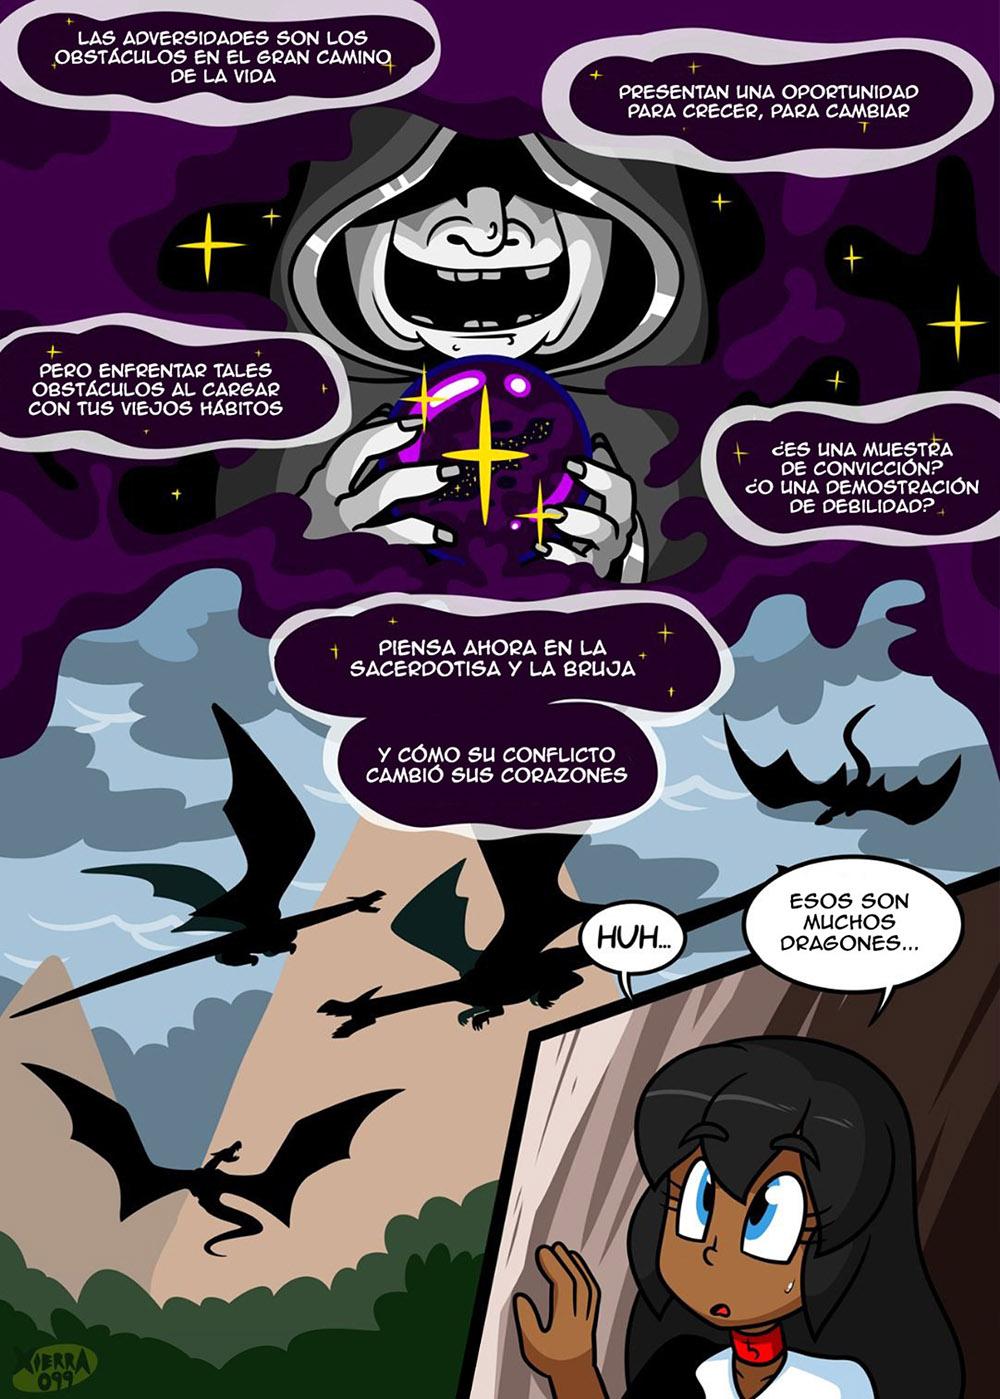 BRIGHT DARKNESS - Heretic Wispers